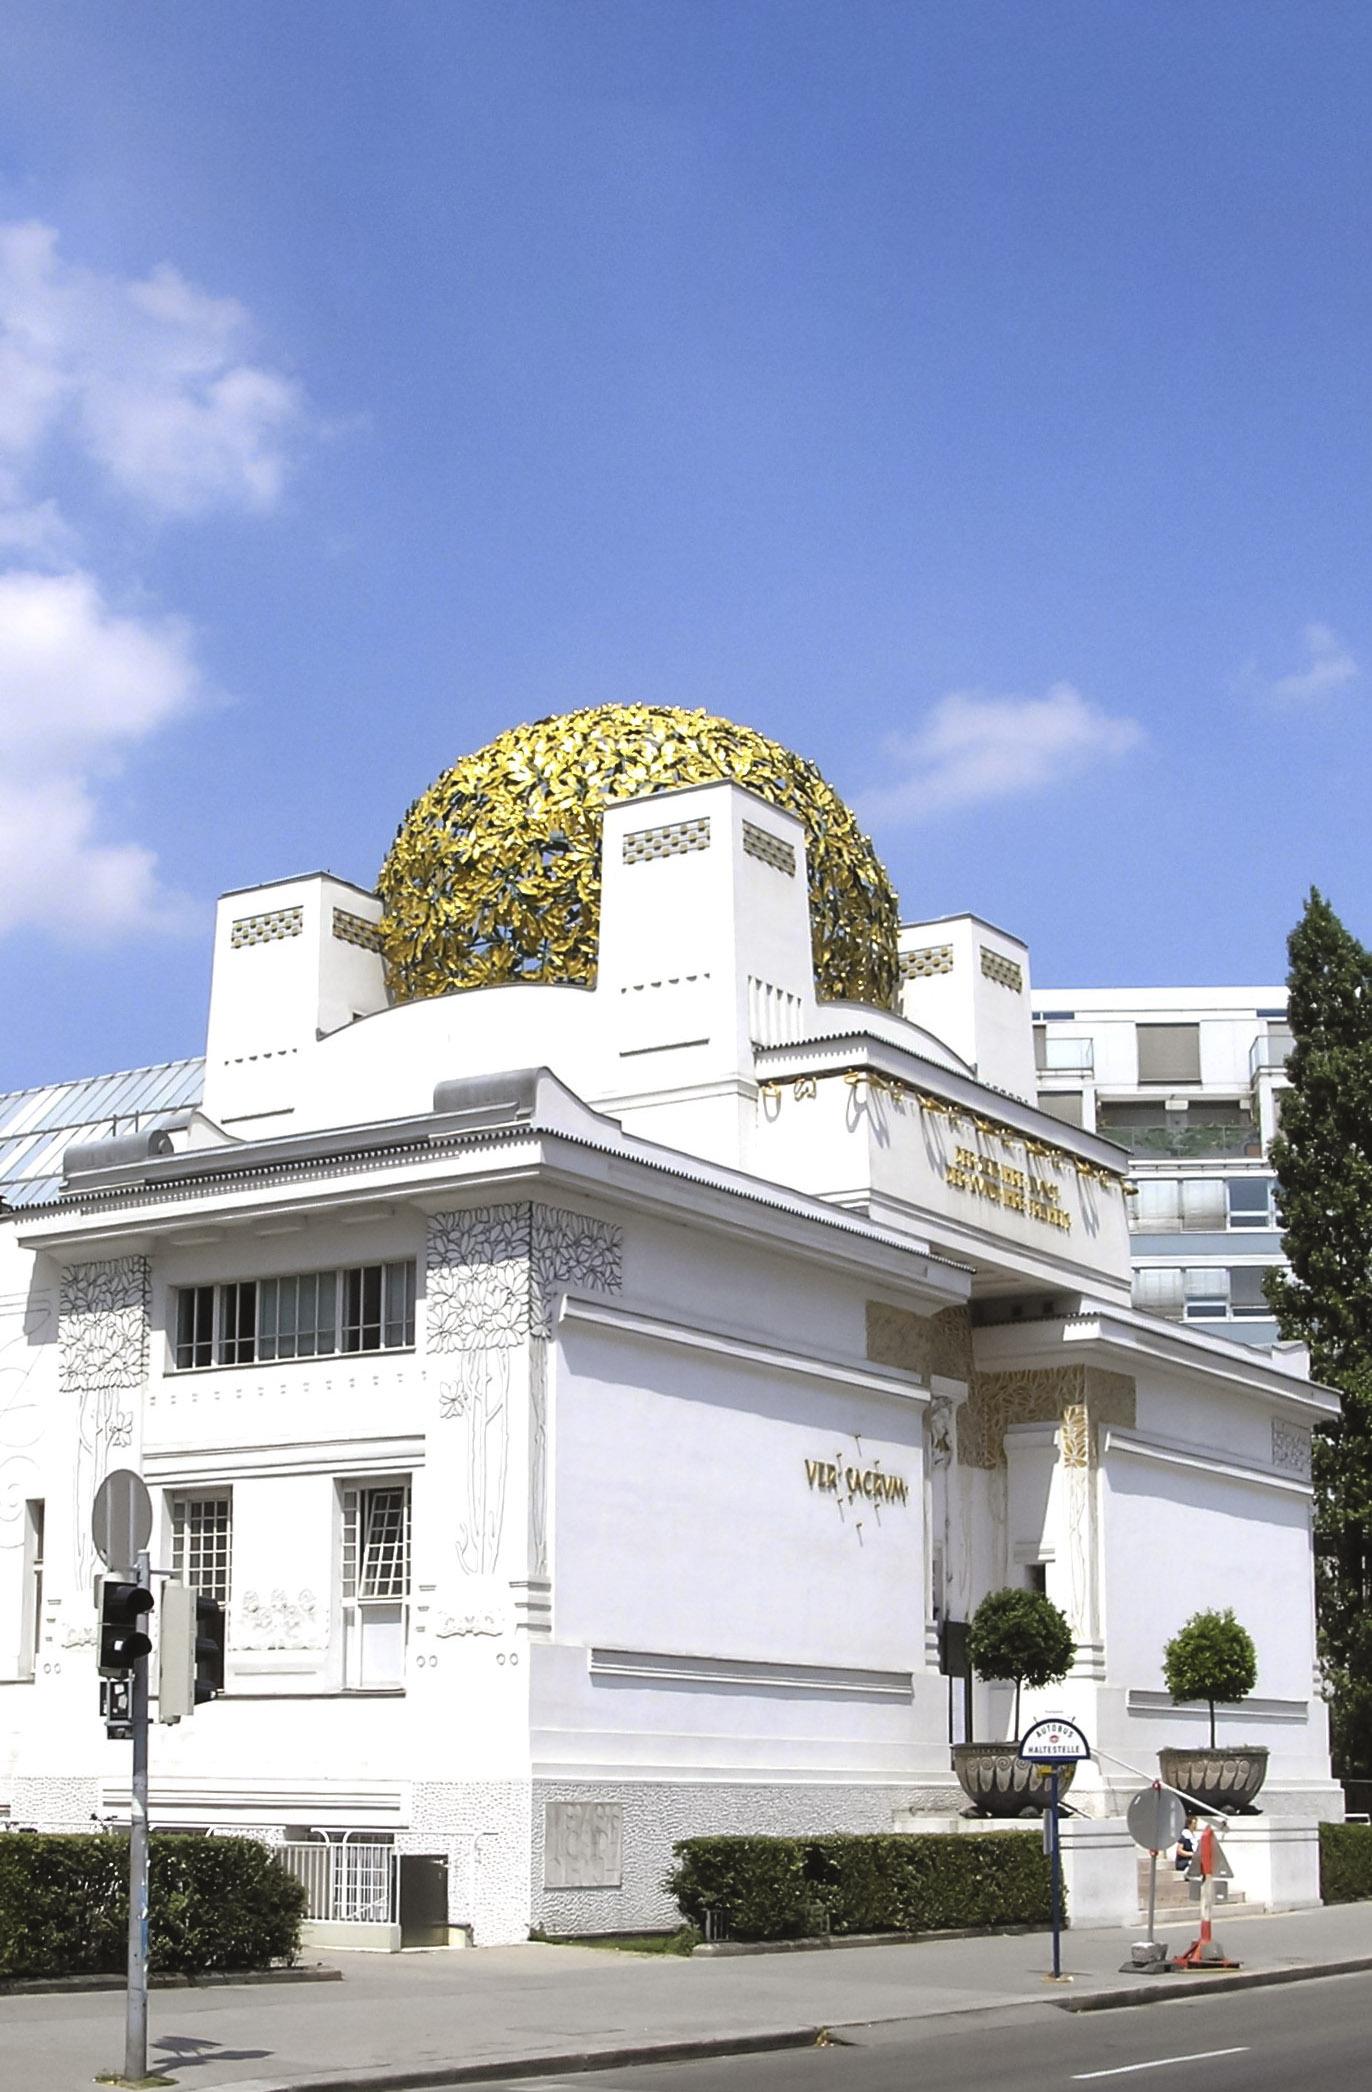 Arquitectura modernista en Viena